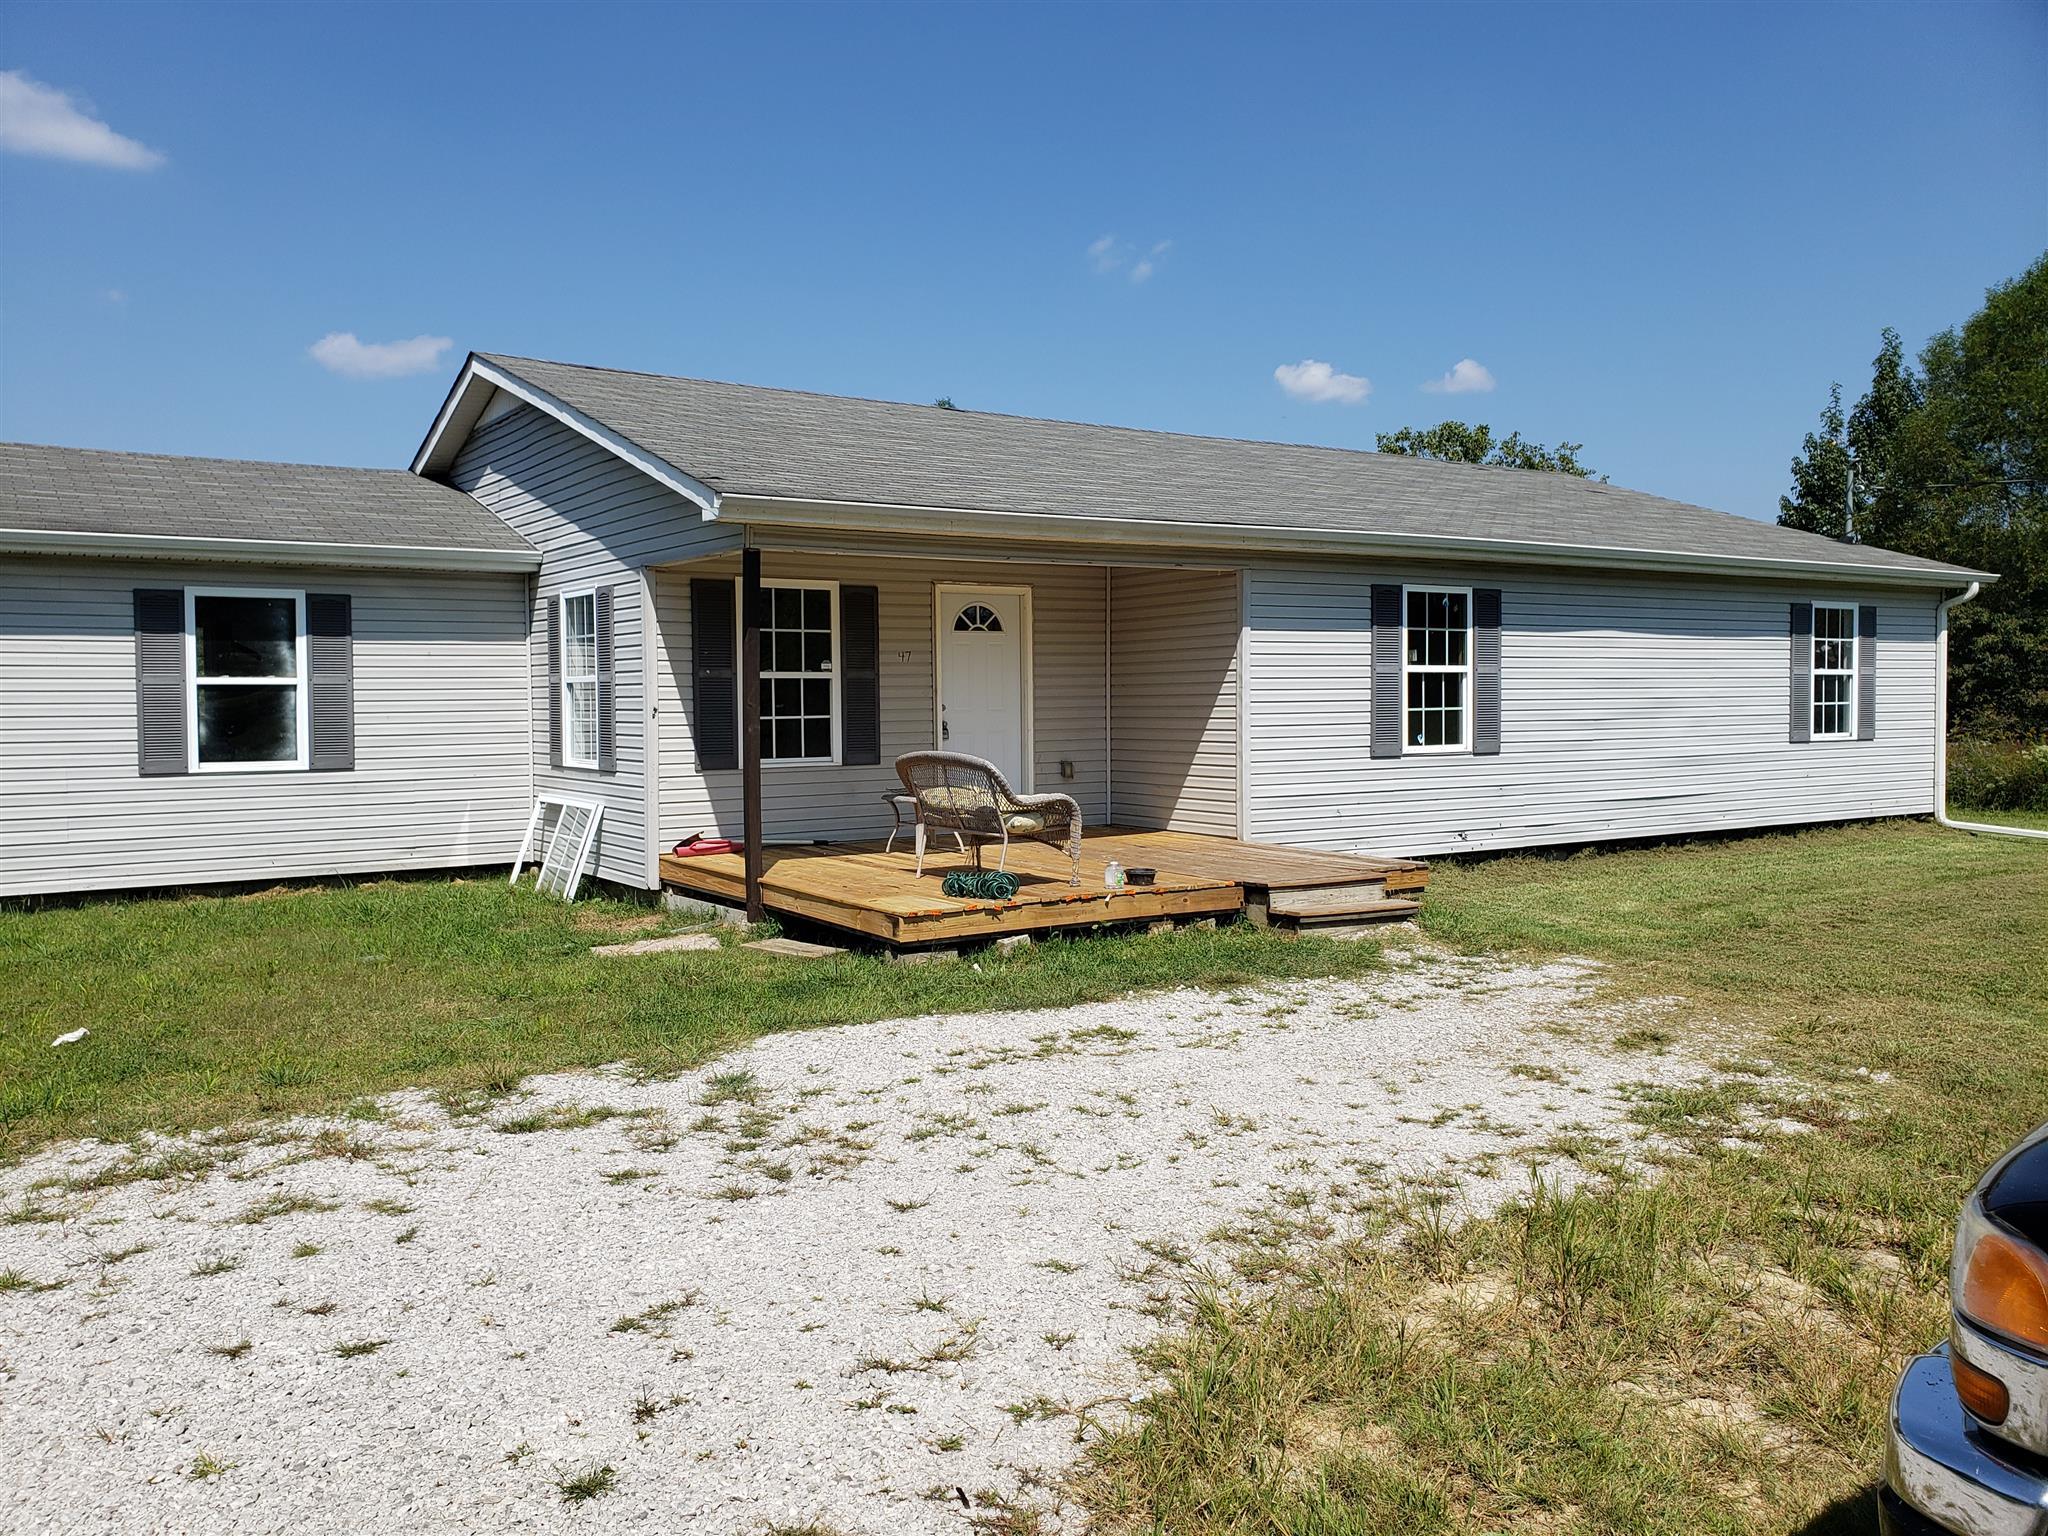 47 McAfee Rd, Morrison, TN 37357 - Morrison, TN real estate listing